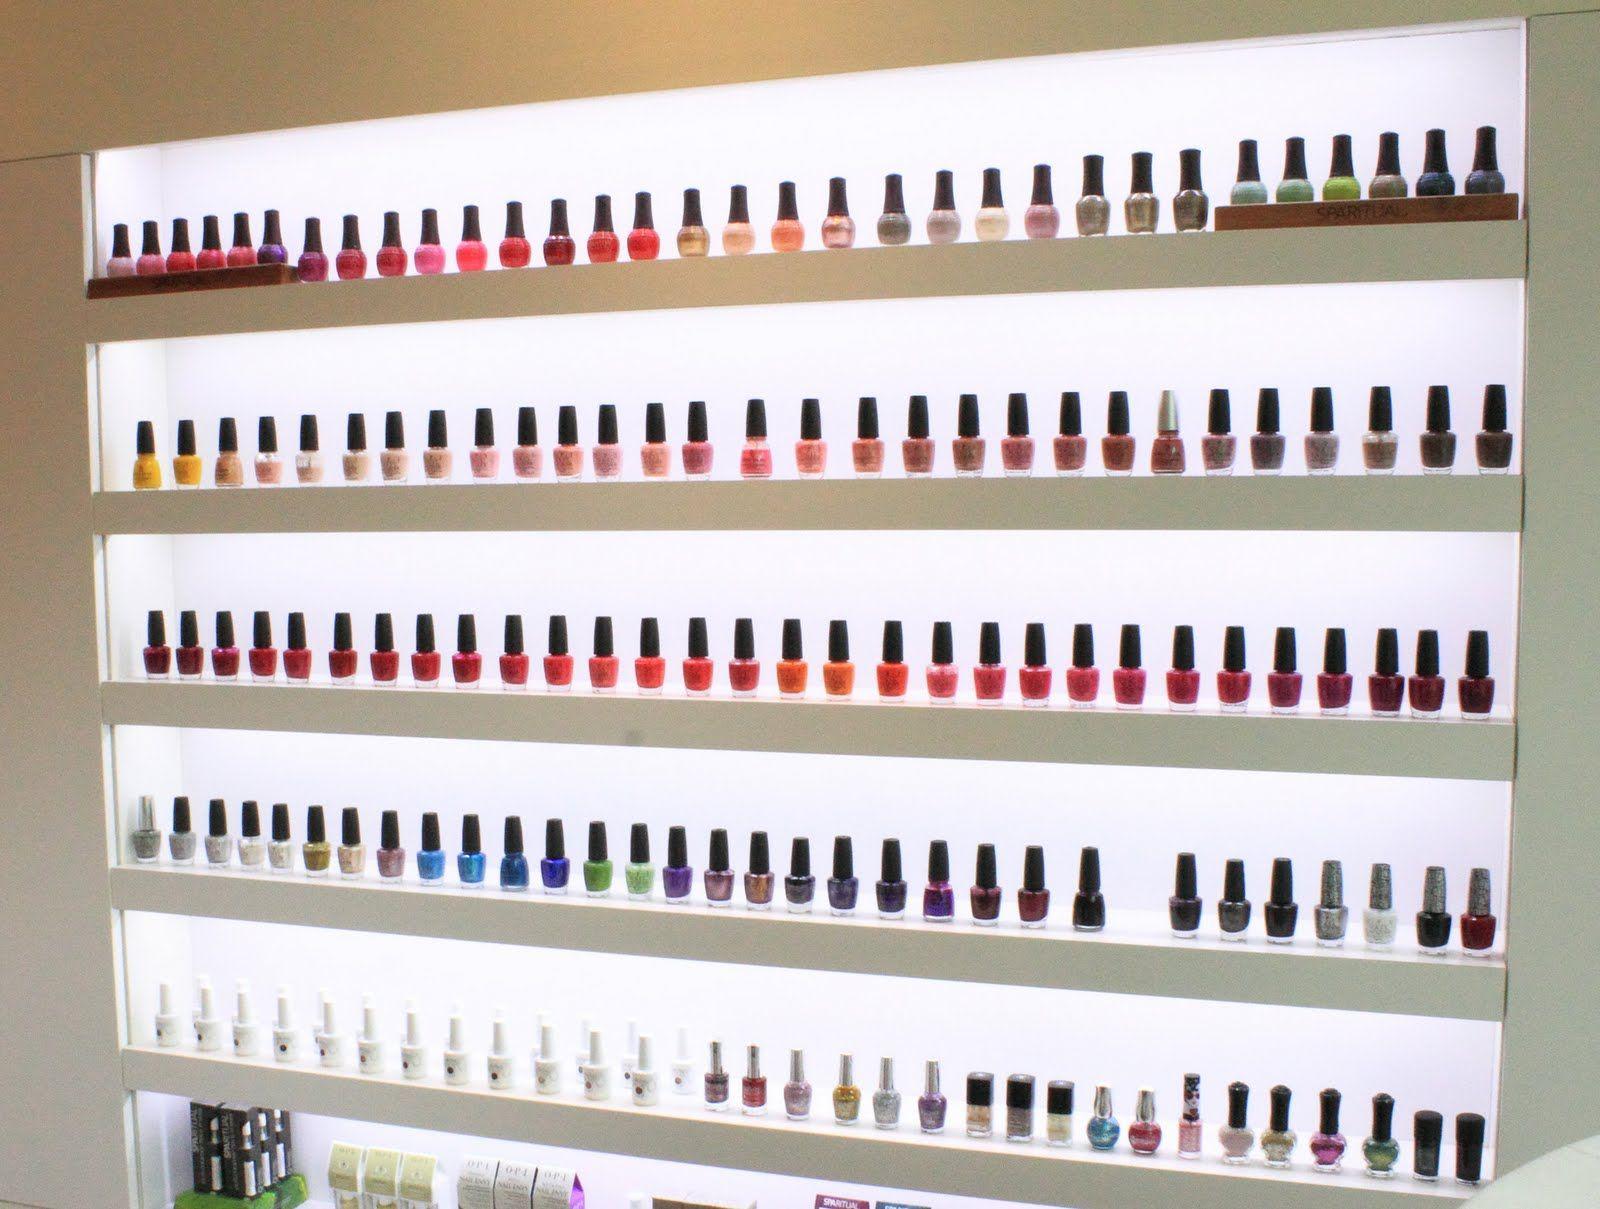 backlit nail polish display